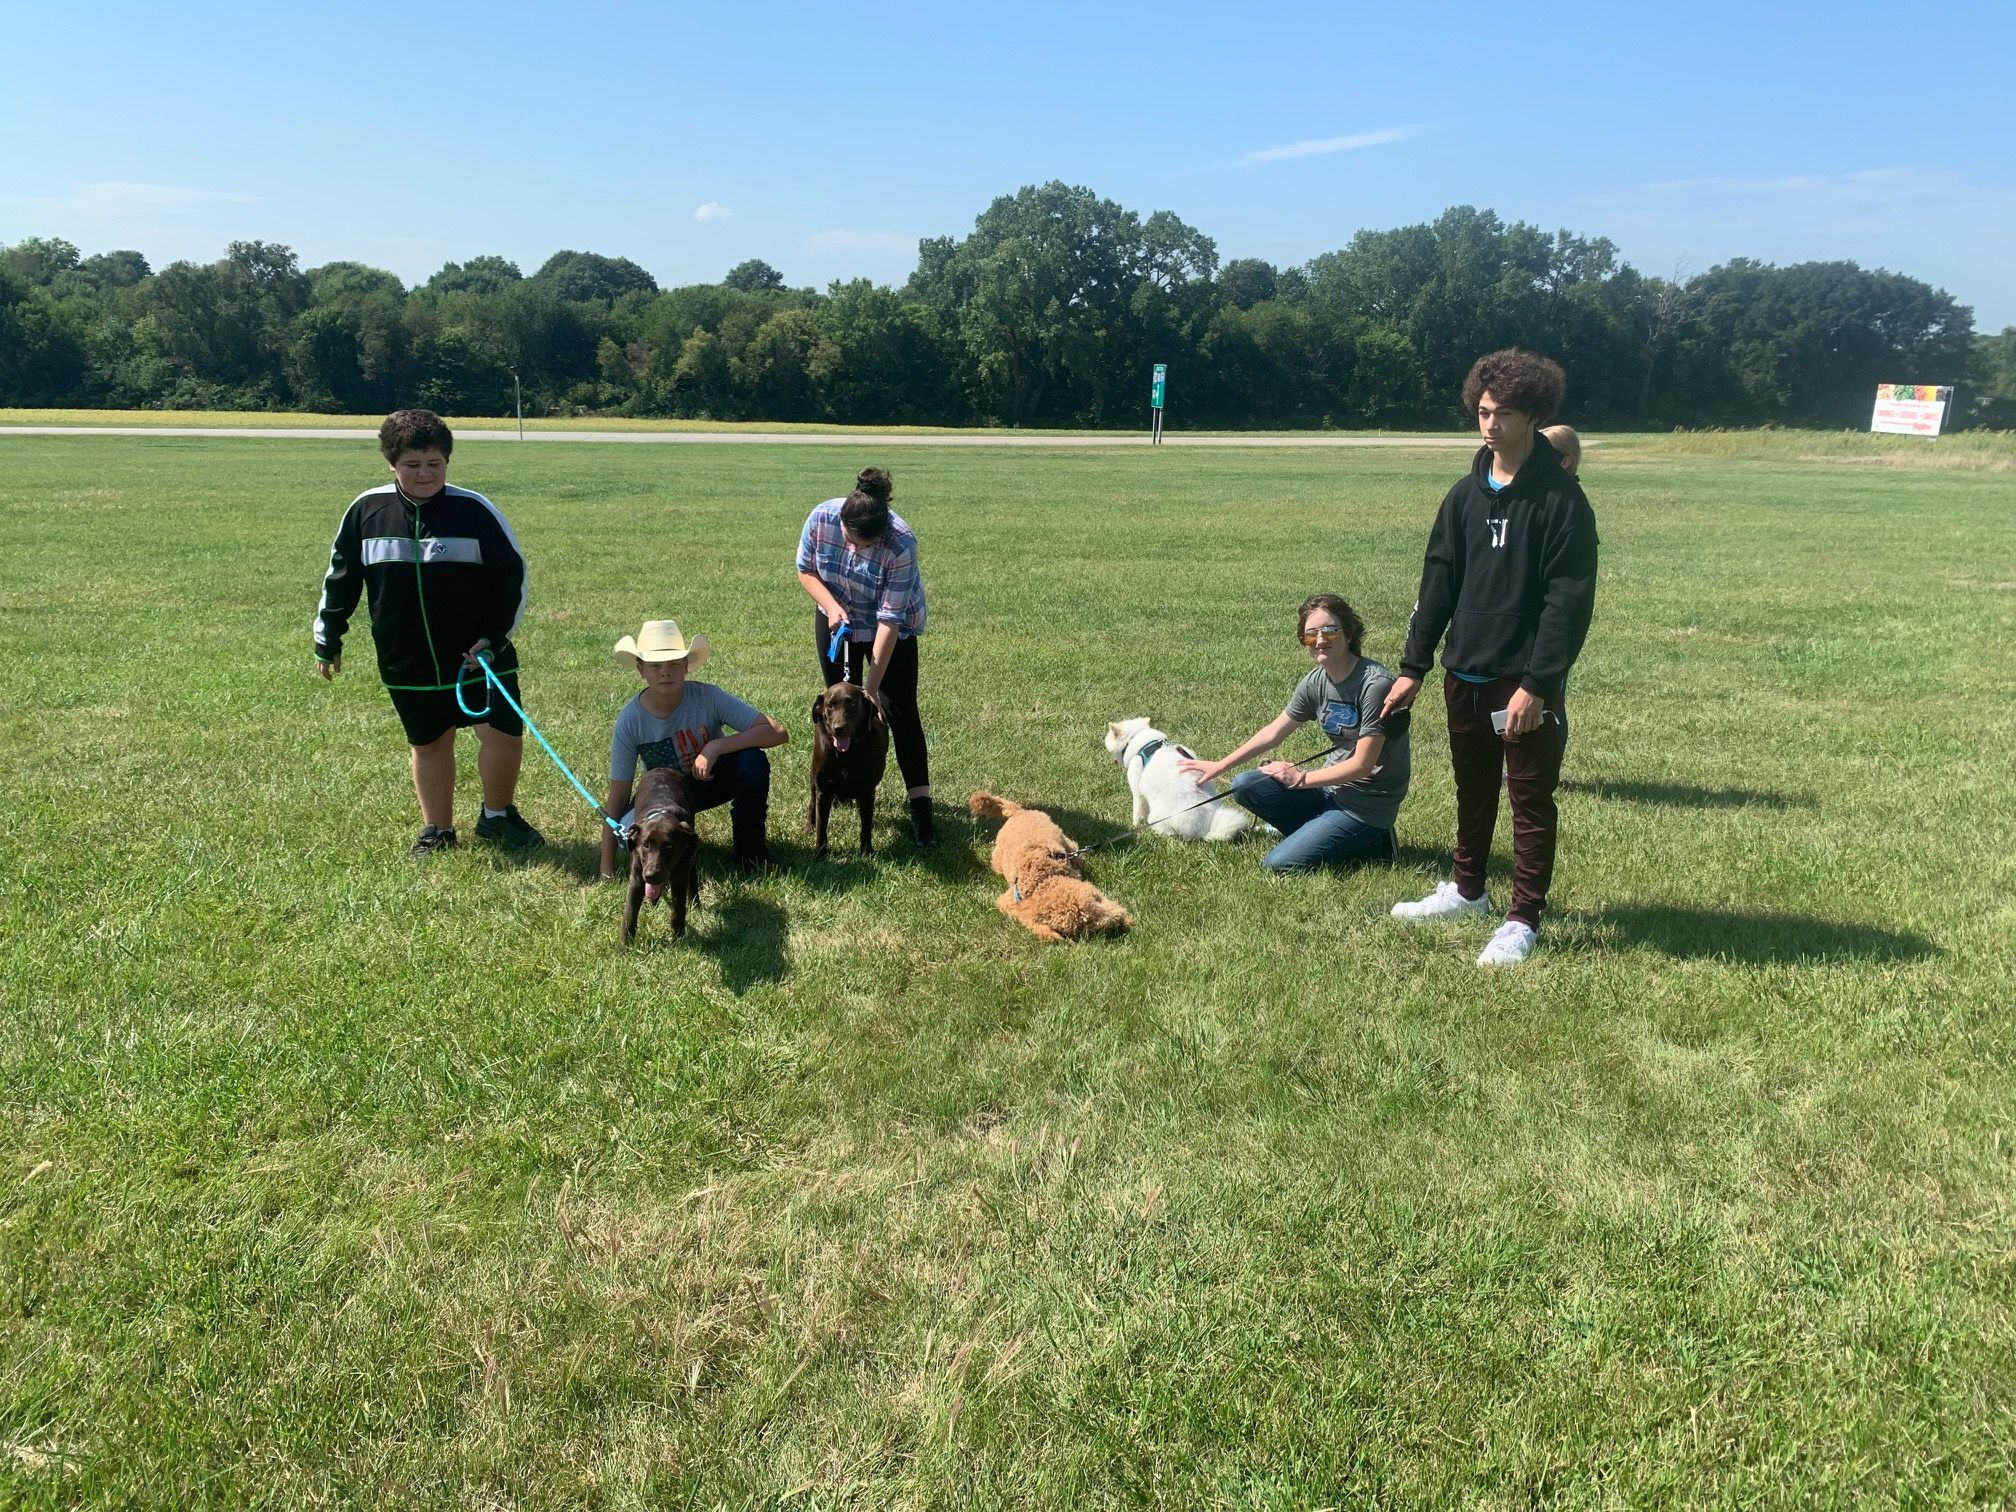 Plattsmouth Doggy Daycare School Based Enterprise